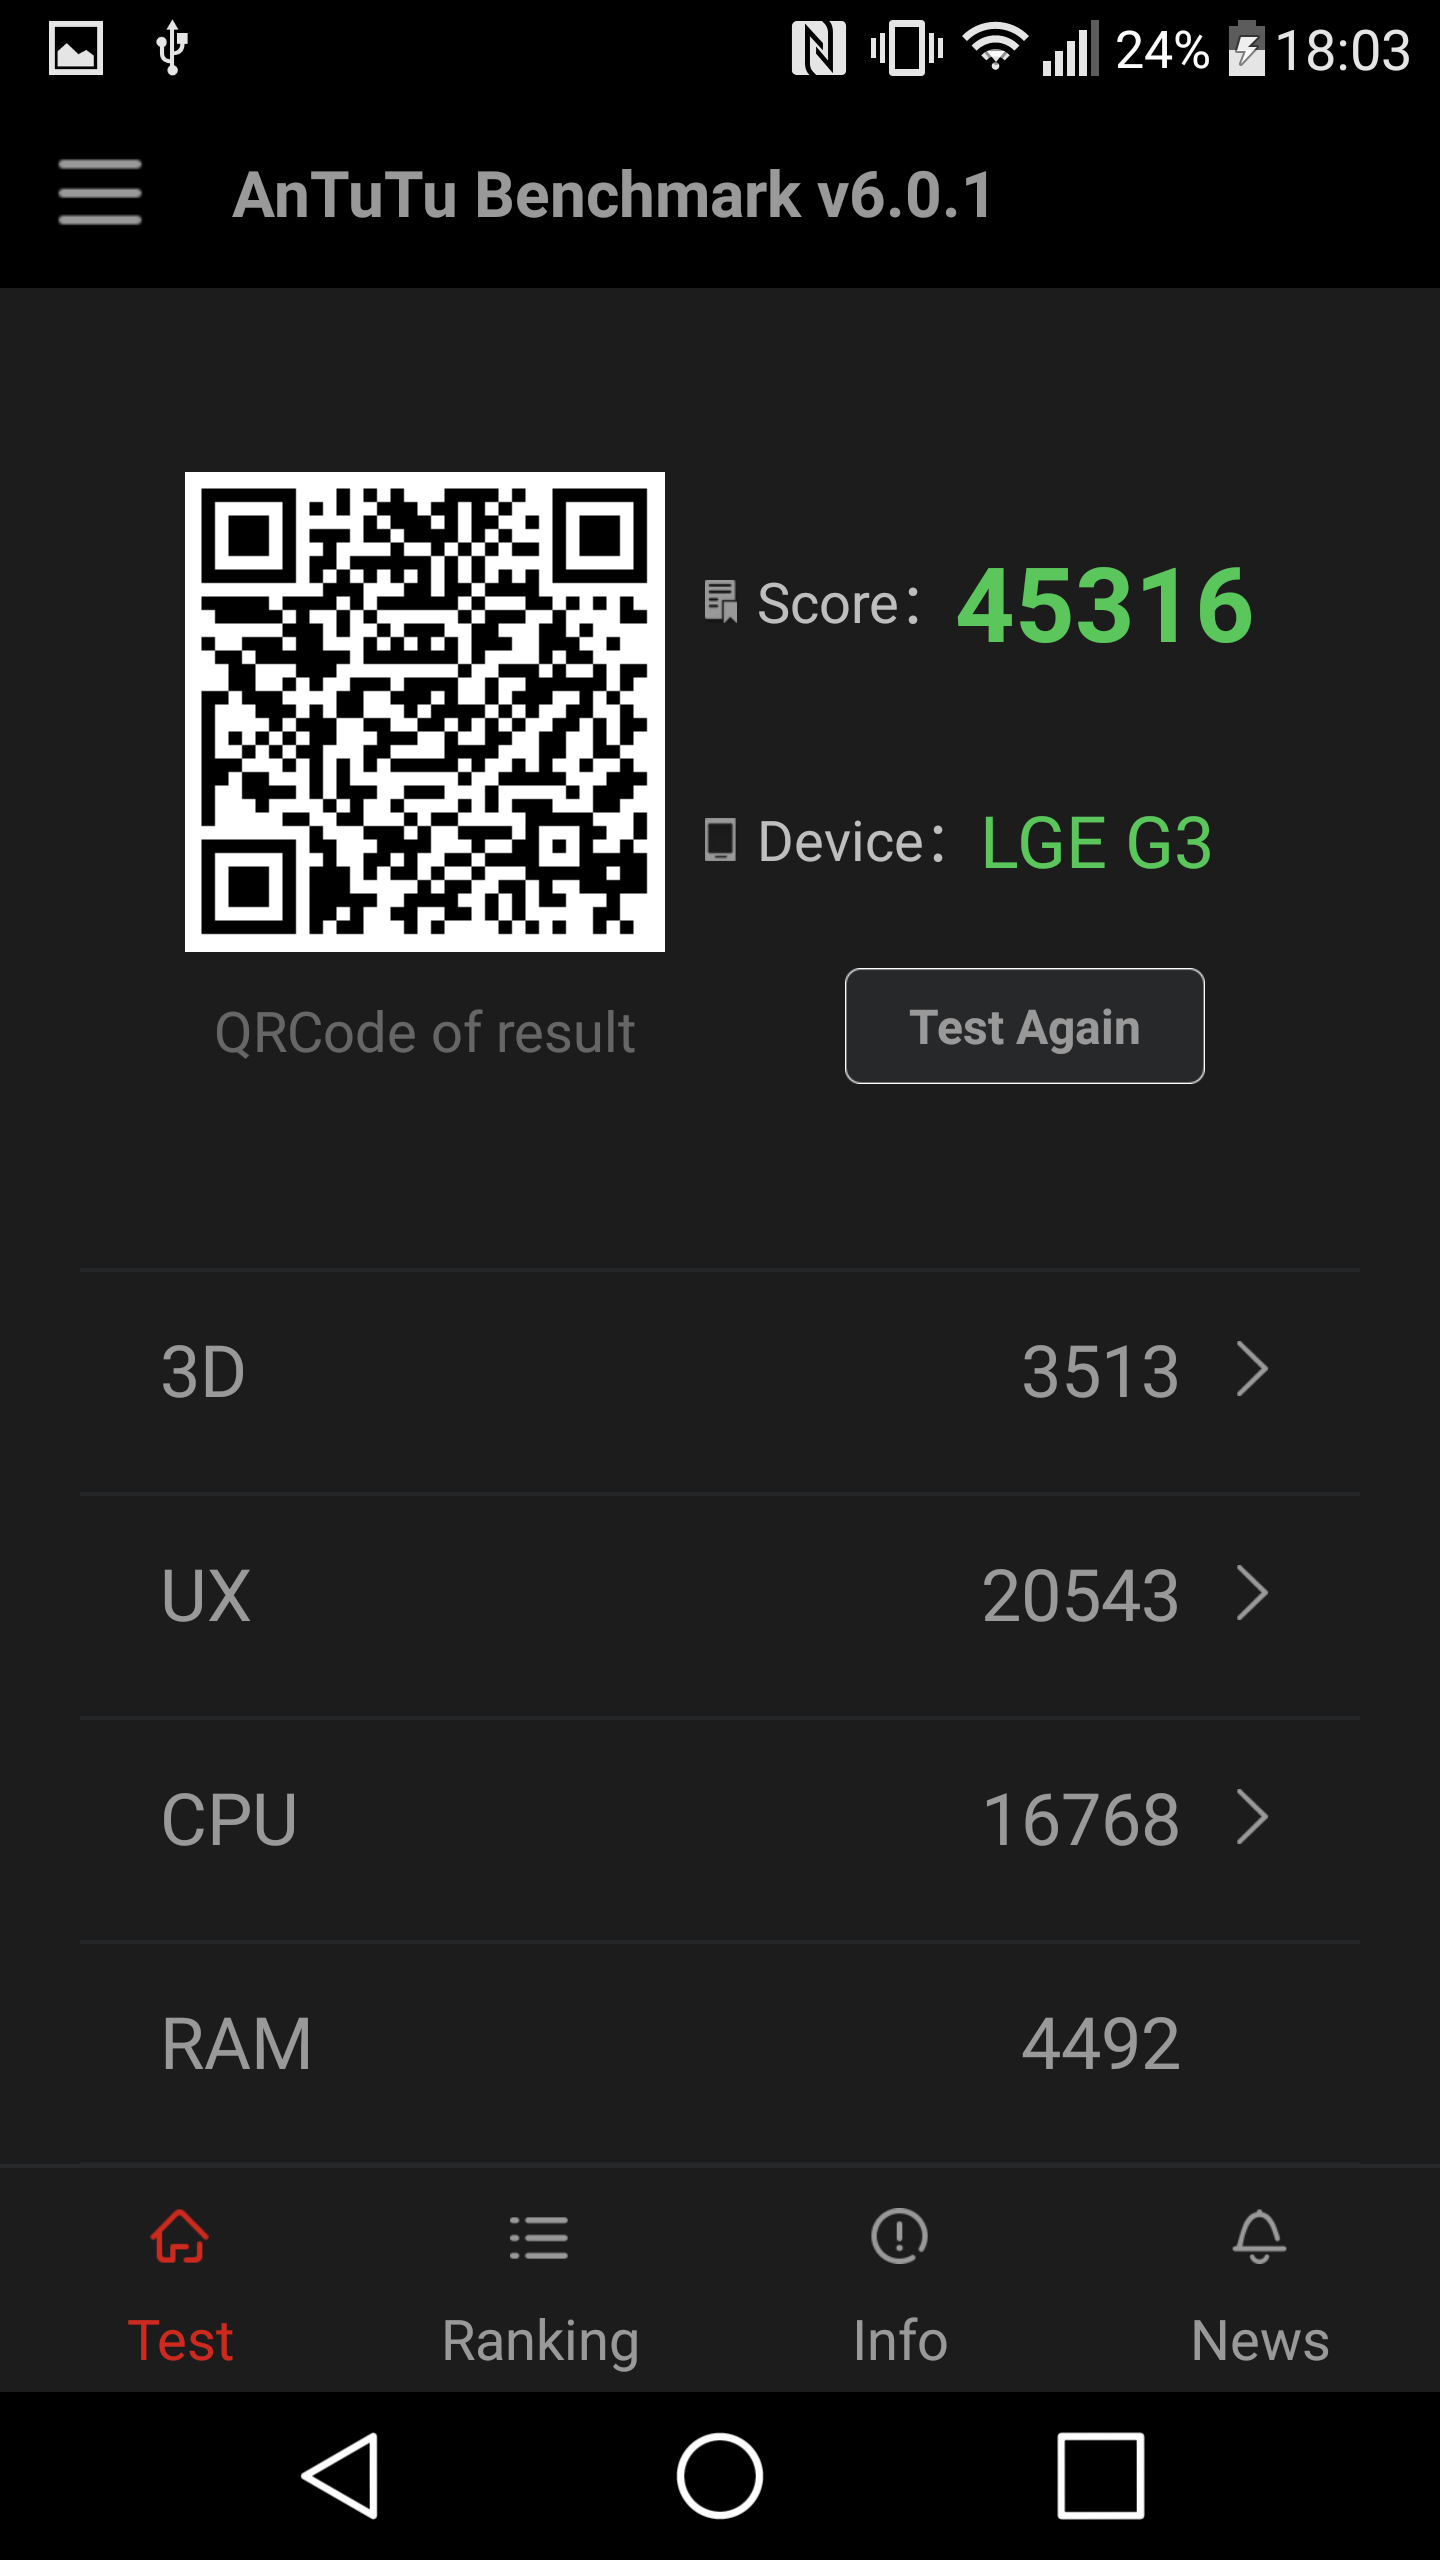 Screenshot_2016-03-25-18-03-57[1] Instalare Android 6 Marshmallow oficial D85530B_00_1217.kdz pe LG G3